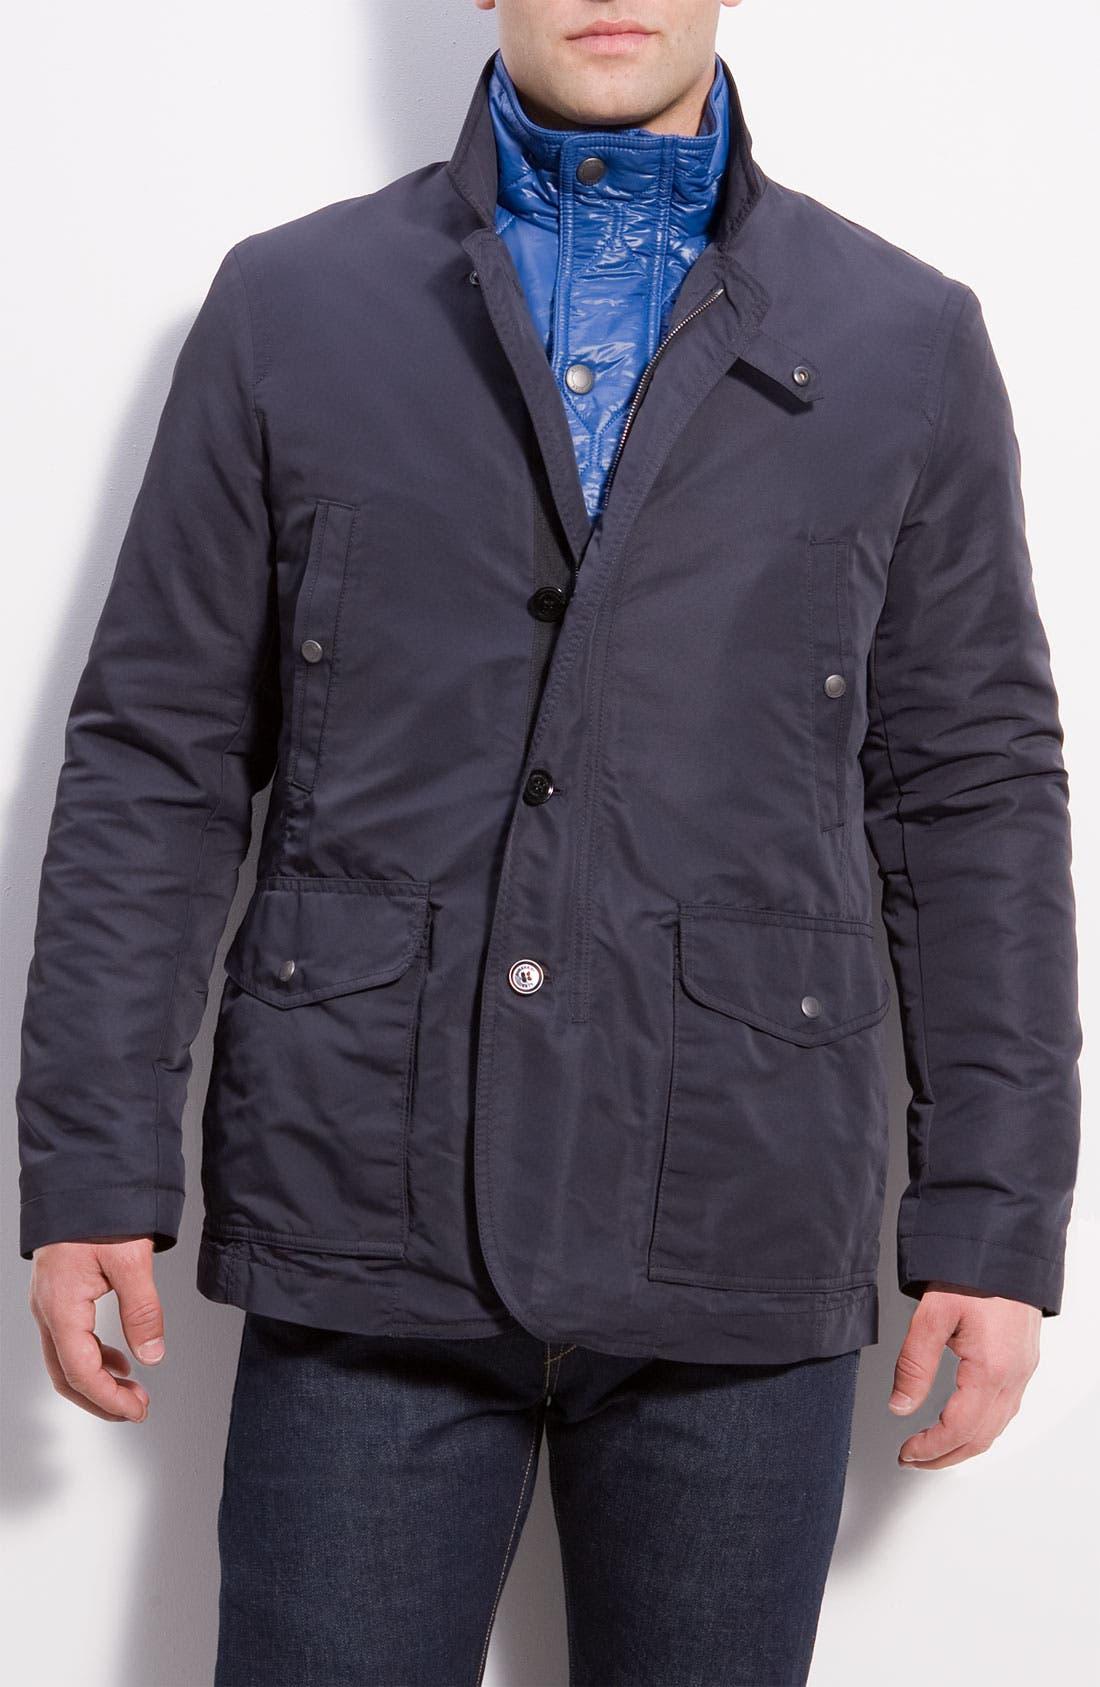 Main Image - Burberry Brit Layered Jacket